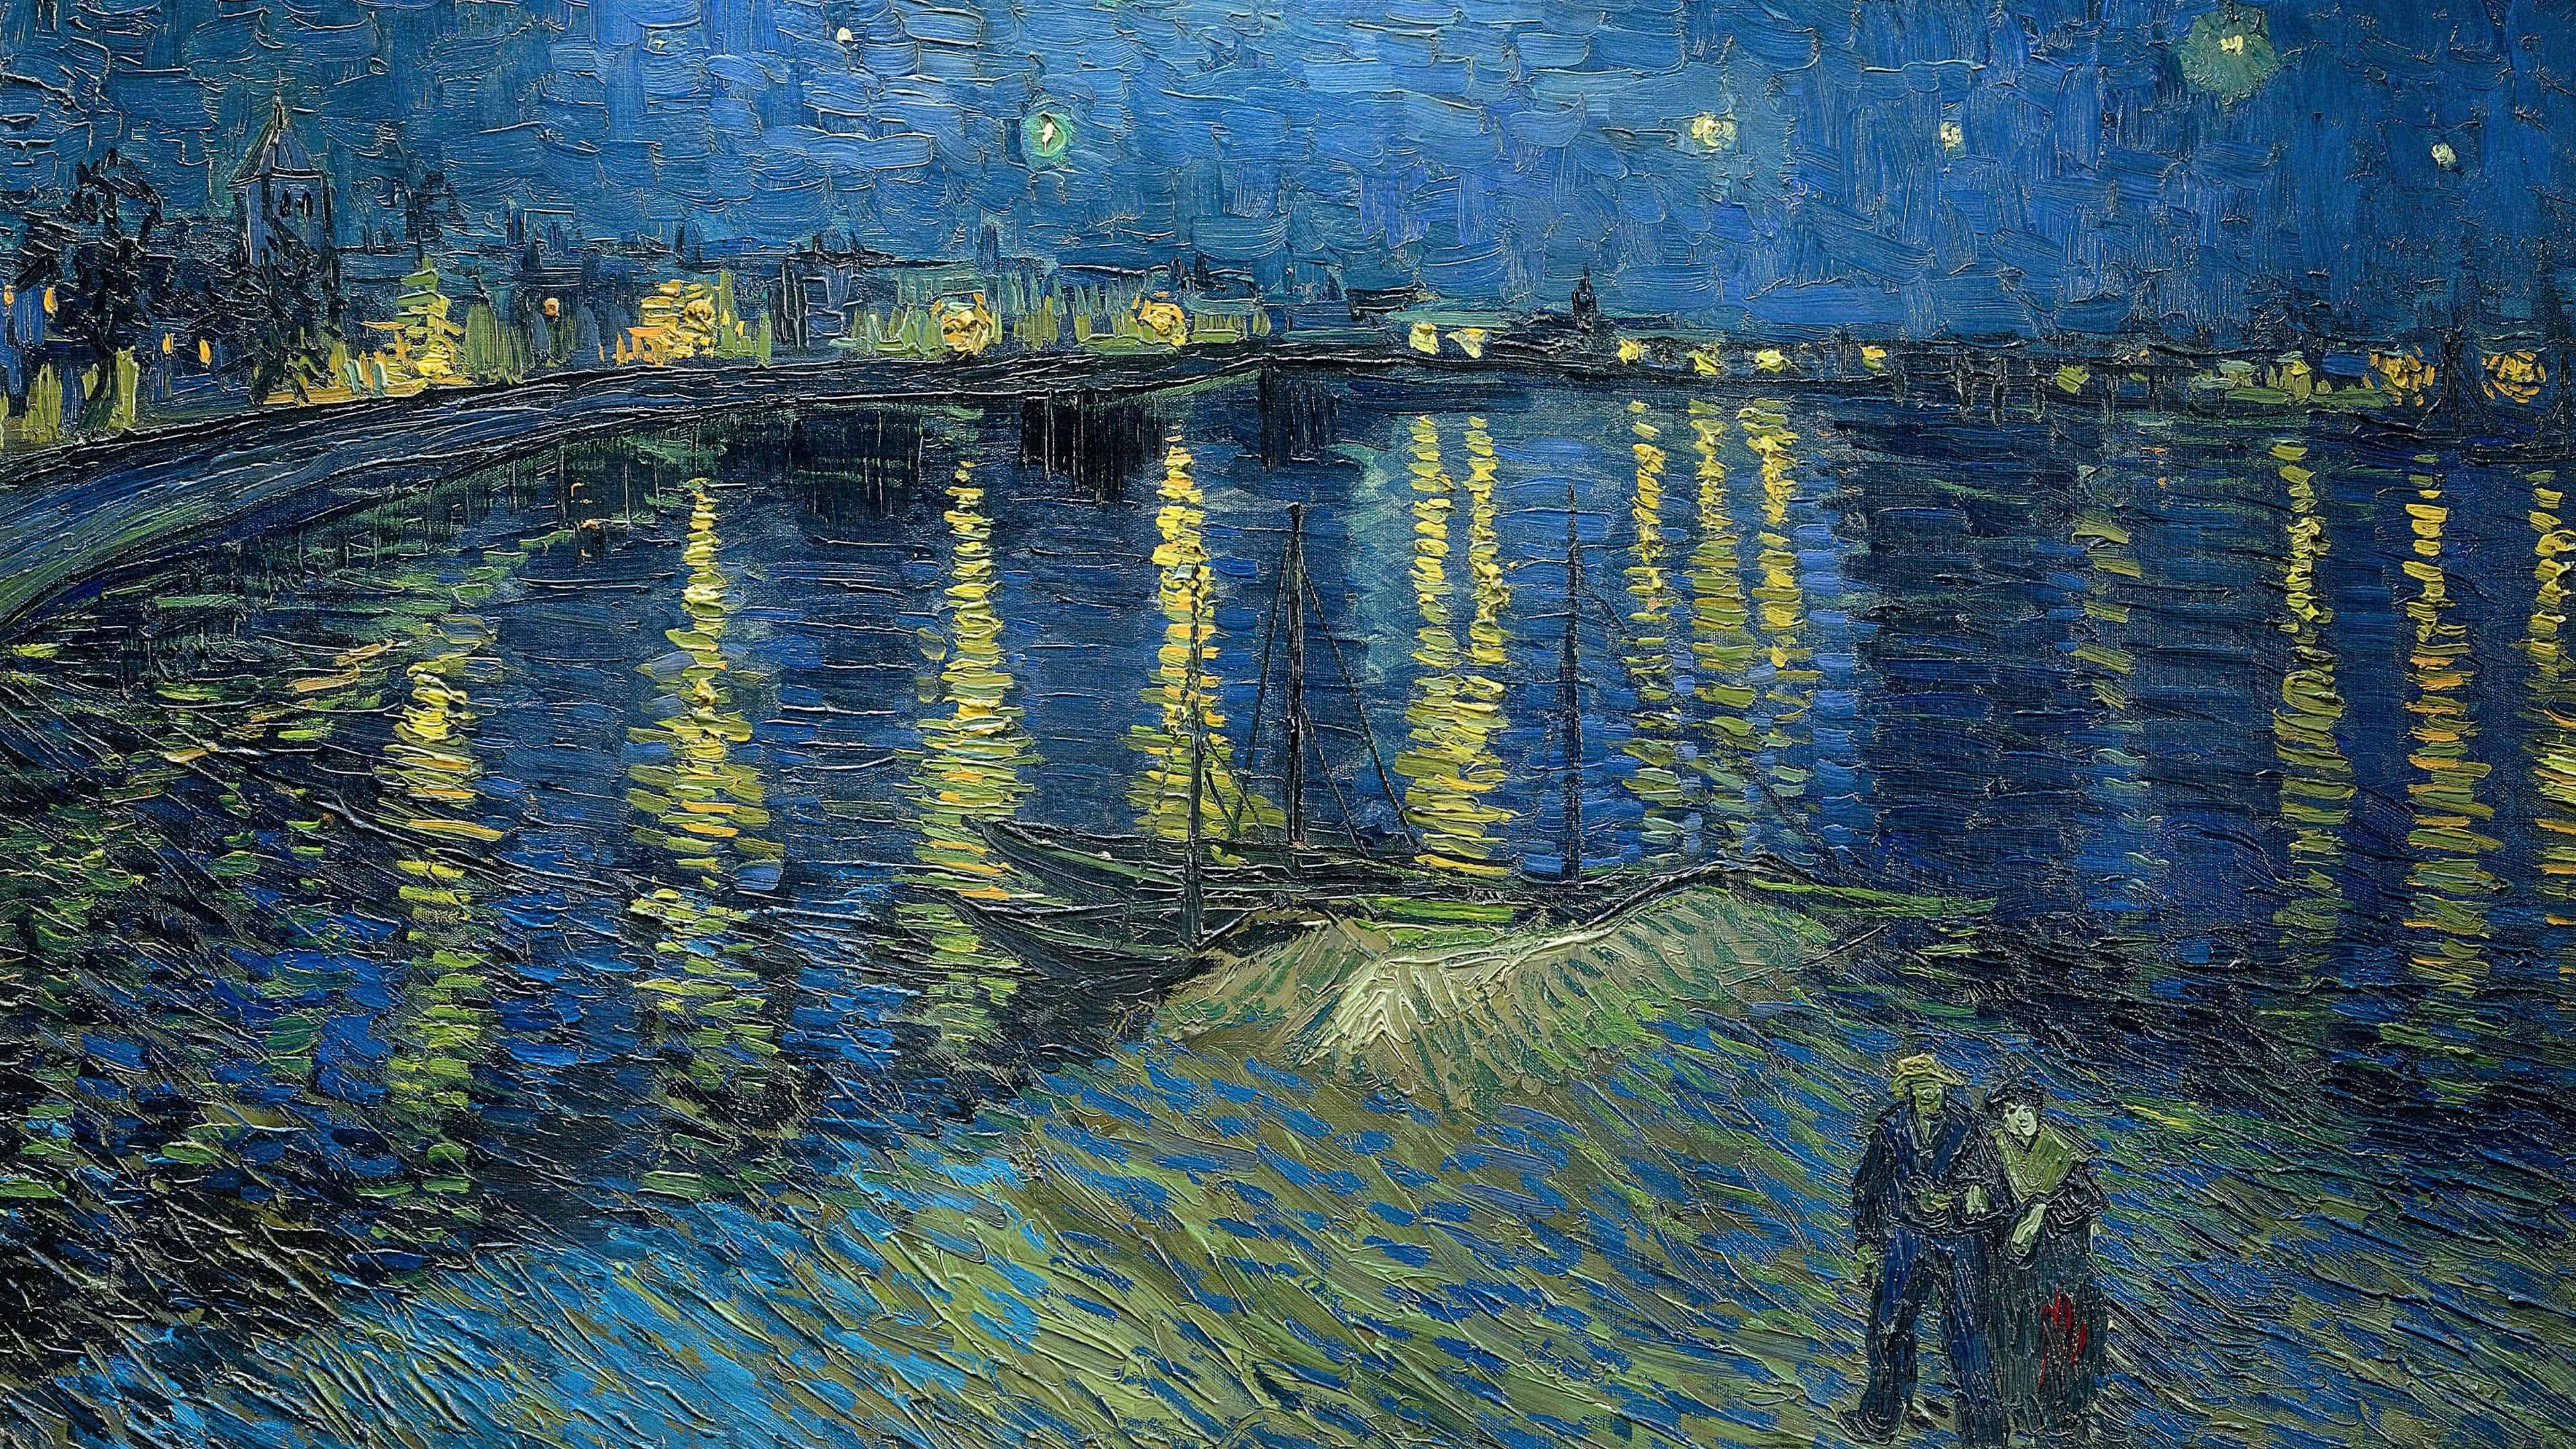 Van Gogh Starry Night 4k 2252514 Hd Wallpaper